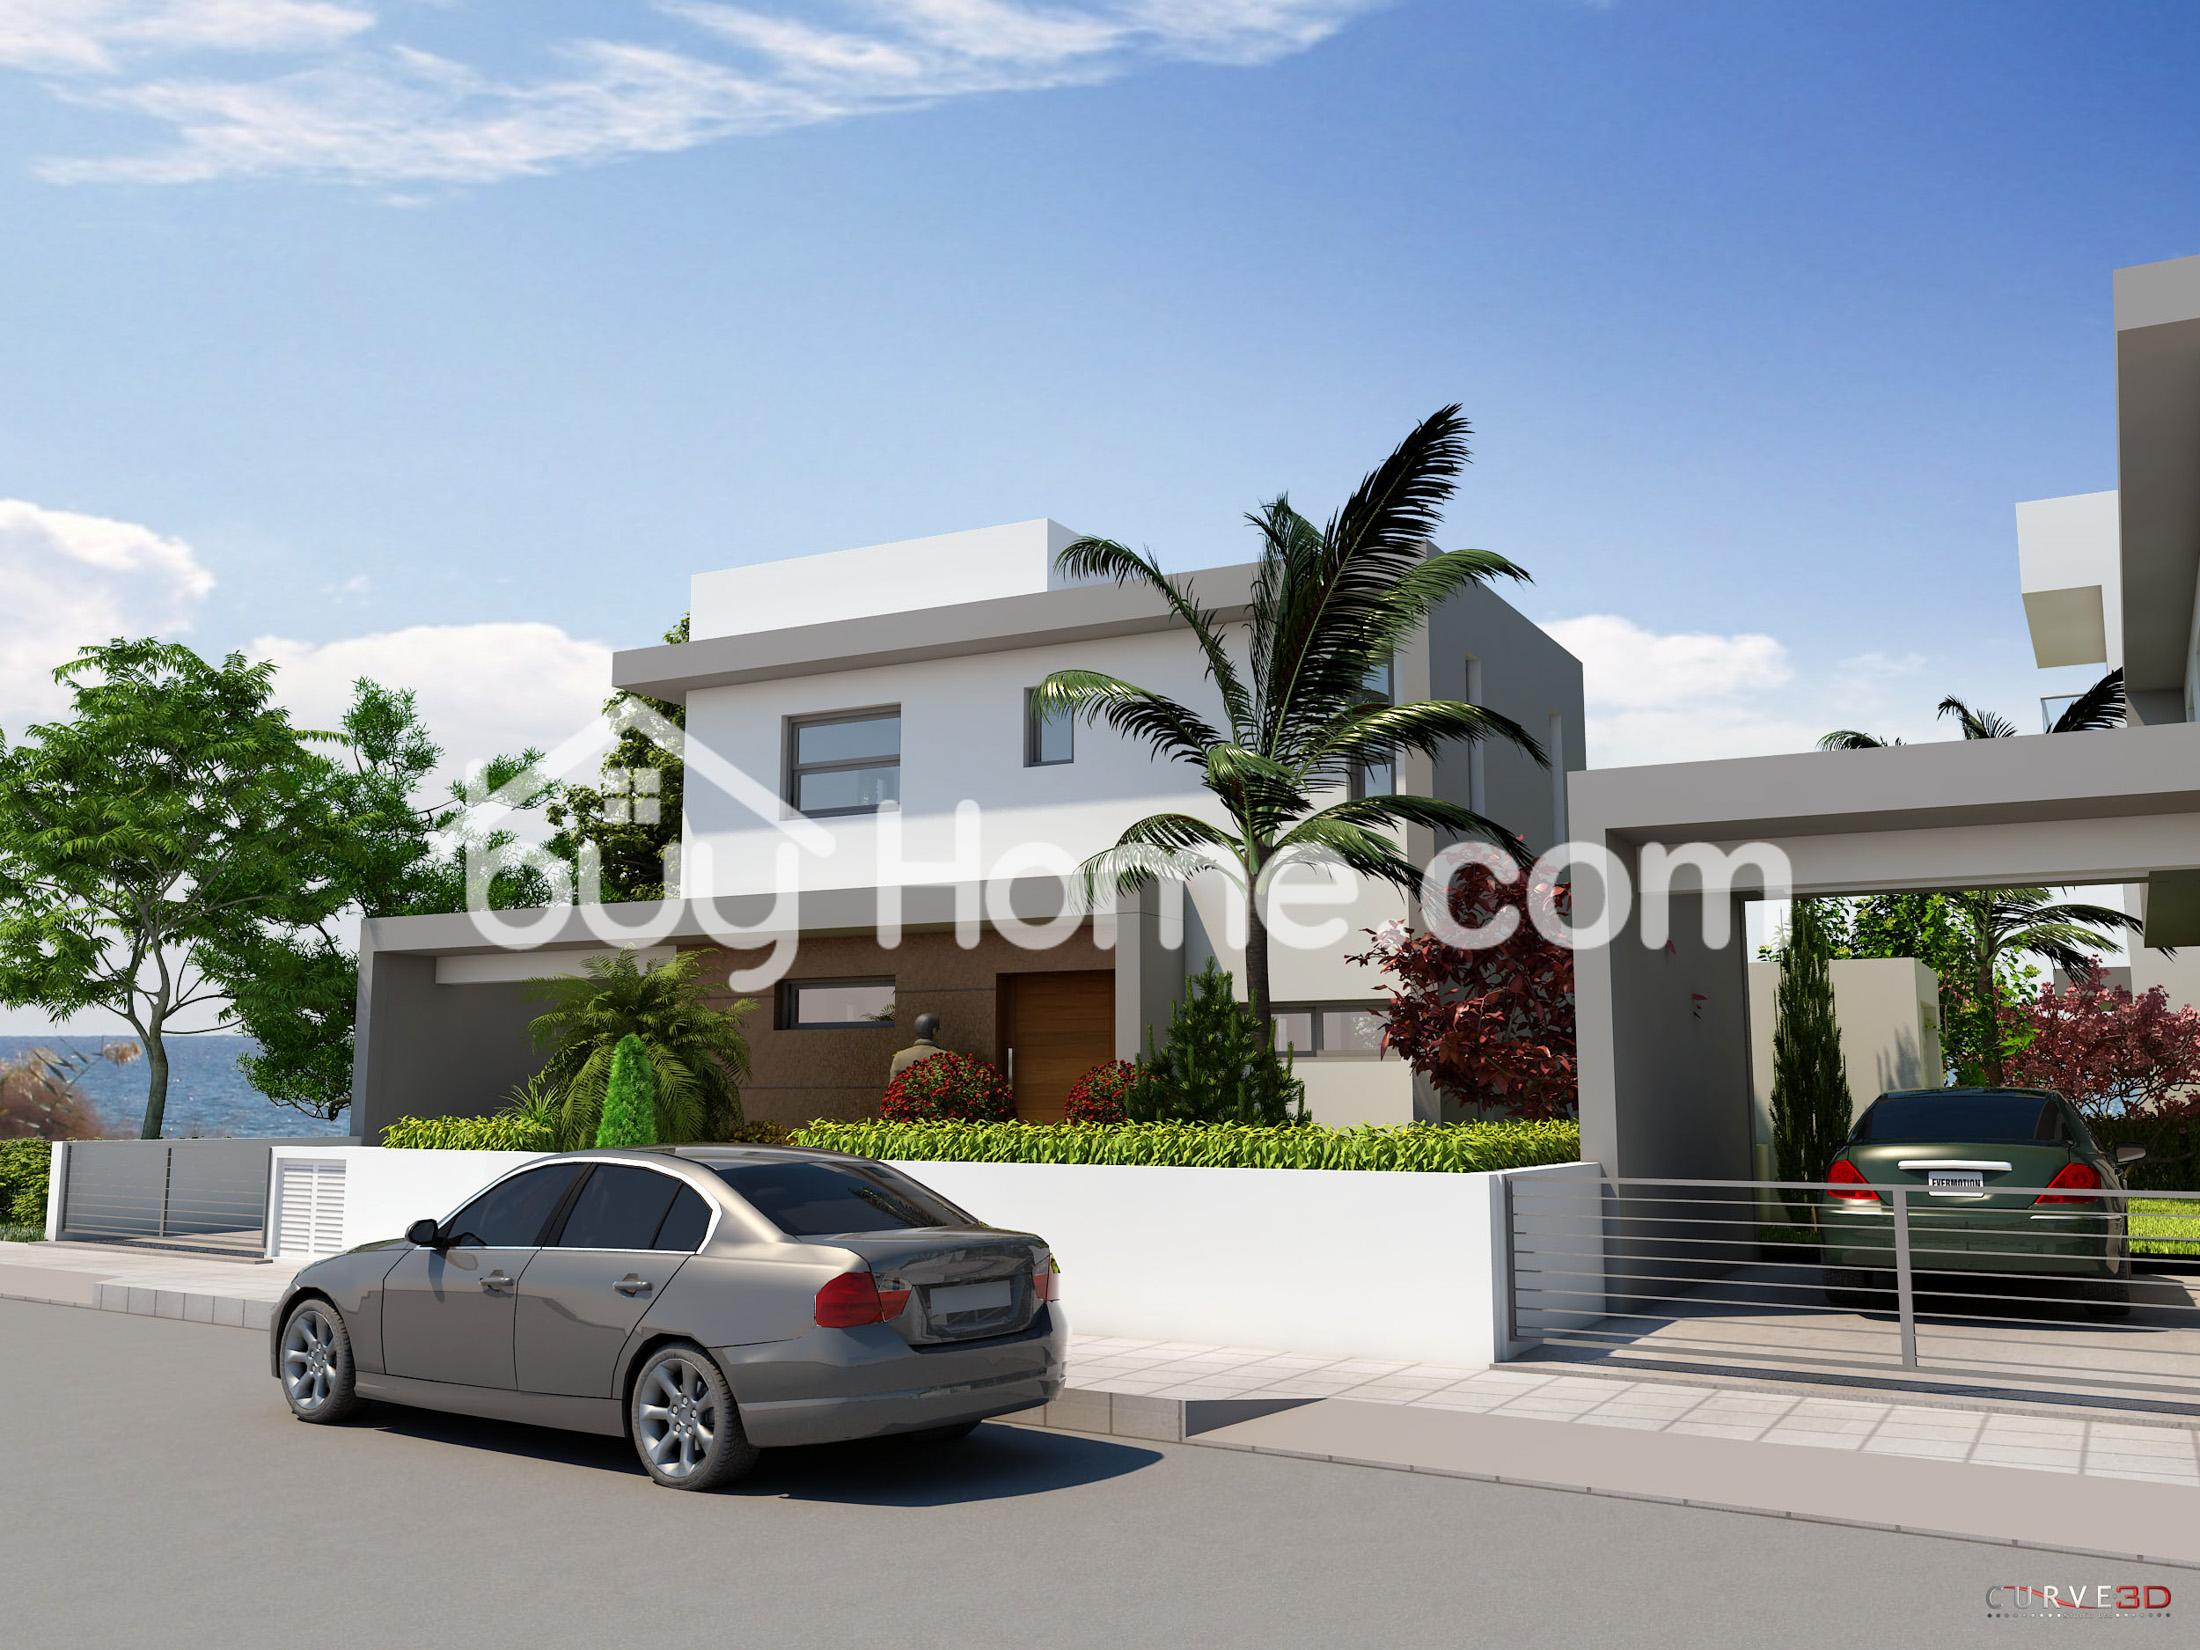 3 Bedroom Coastal House | BuyHome